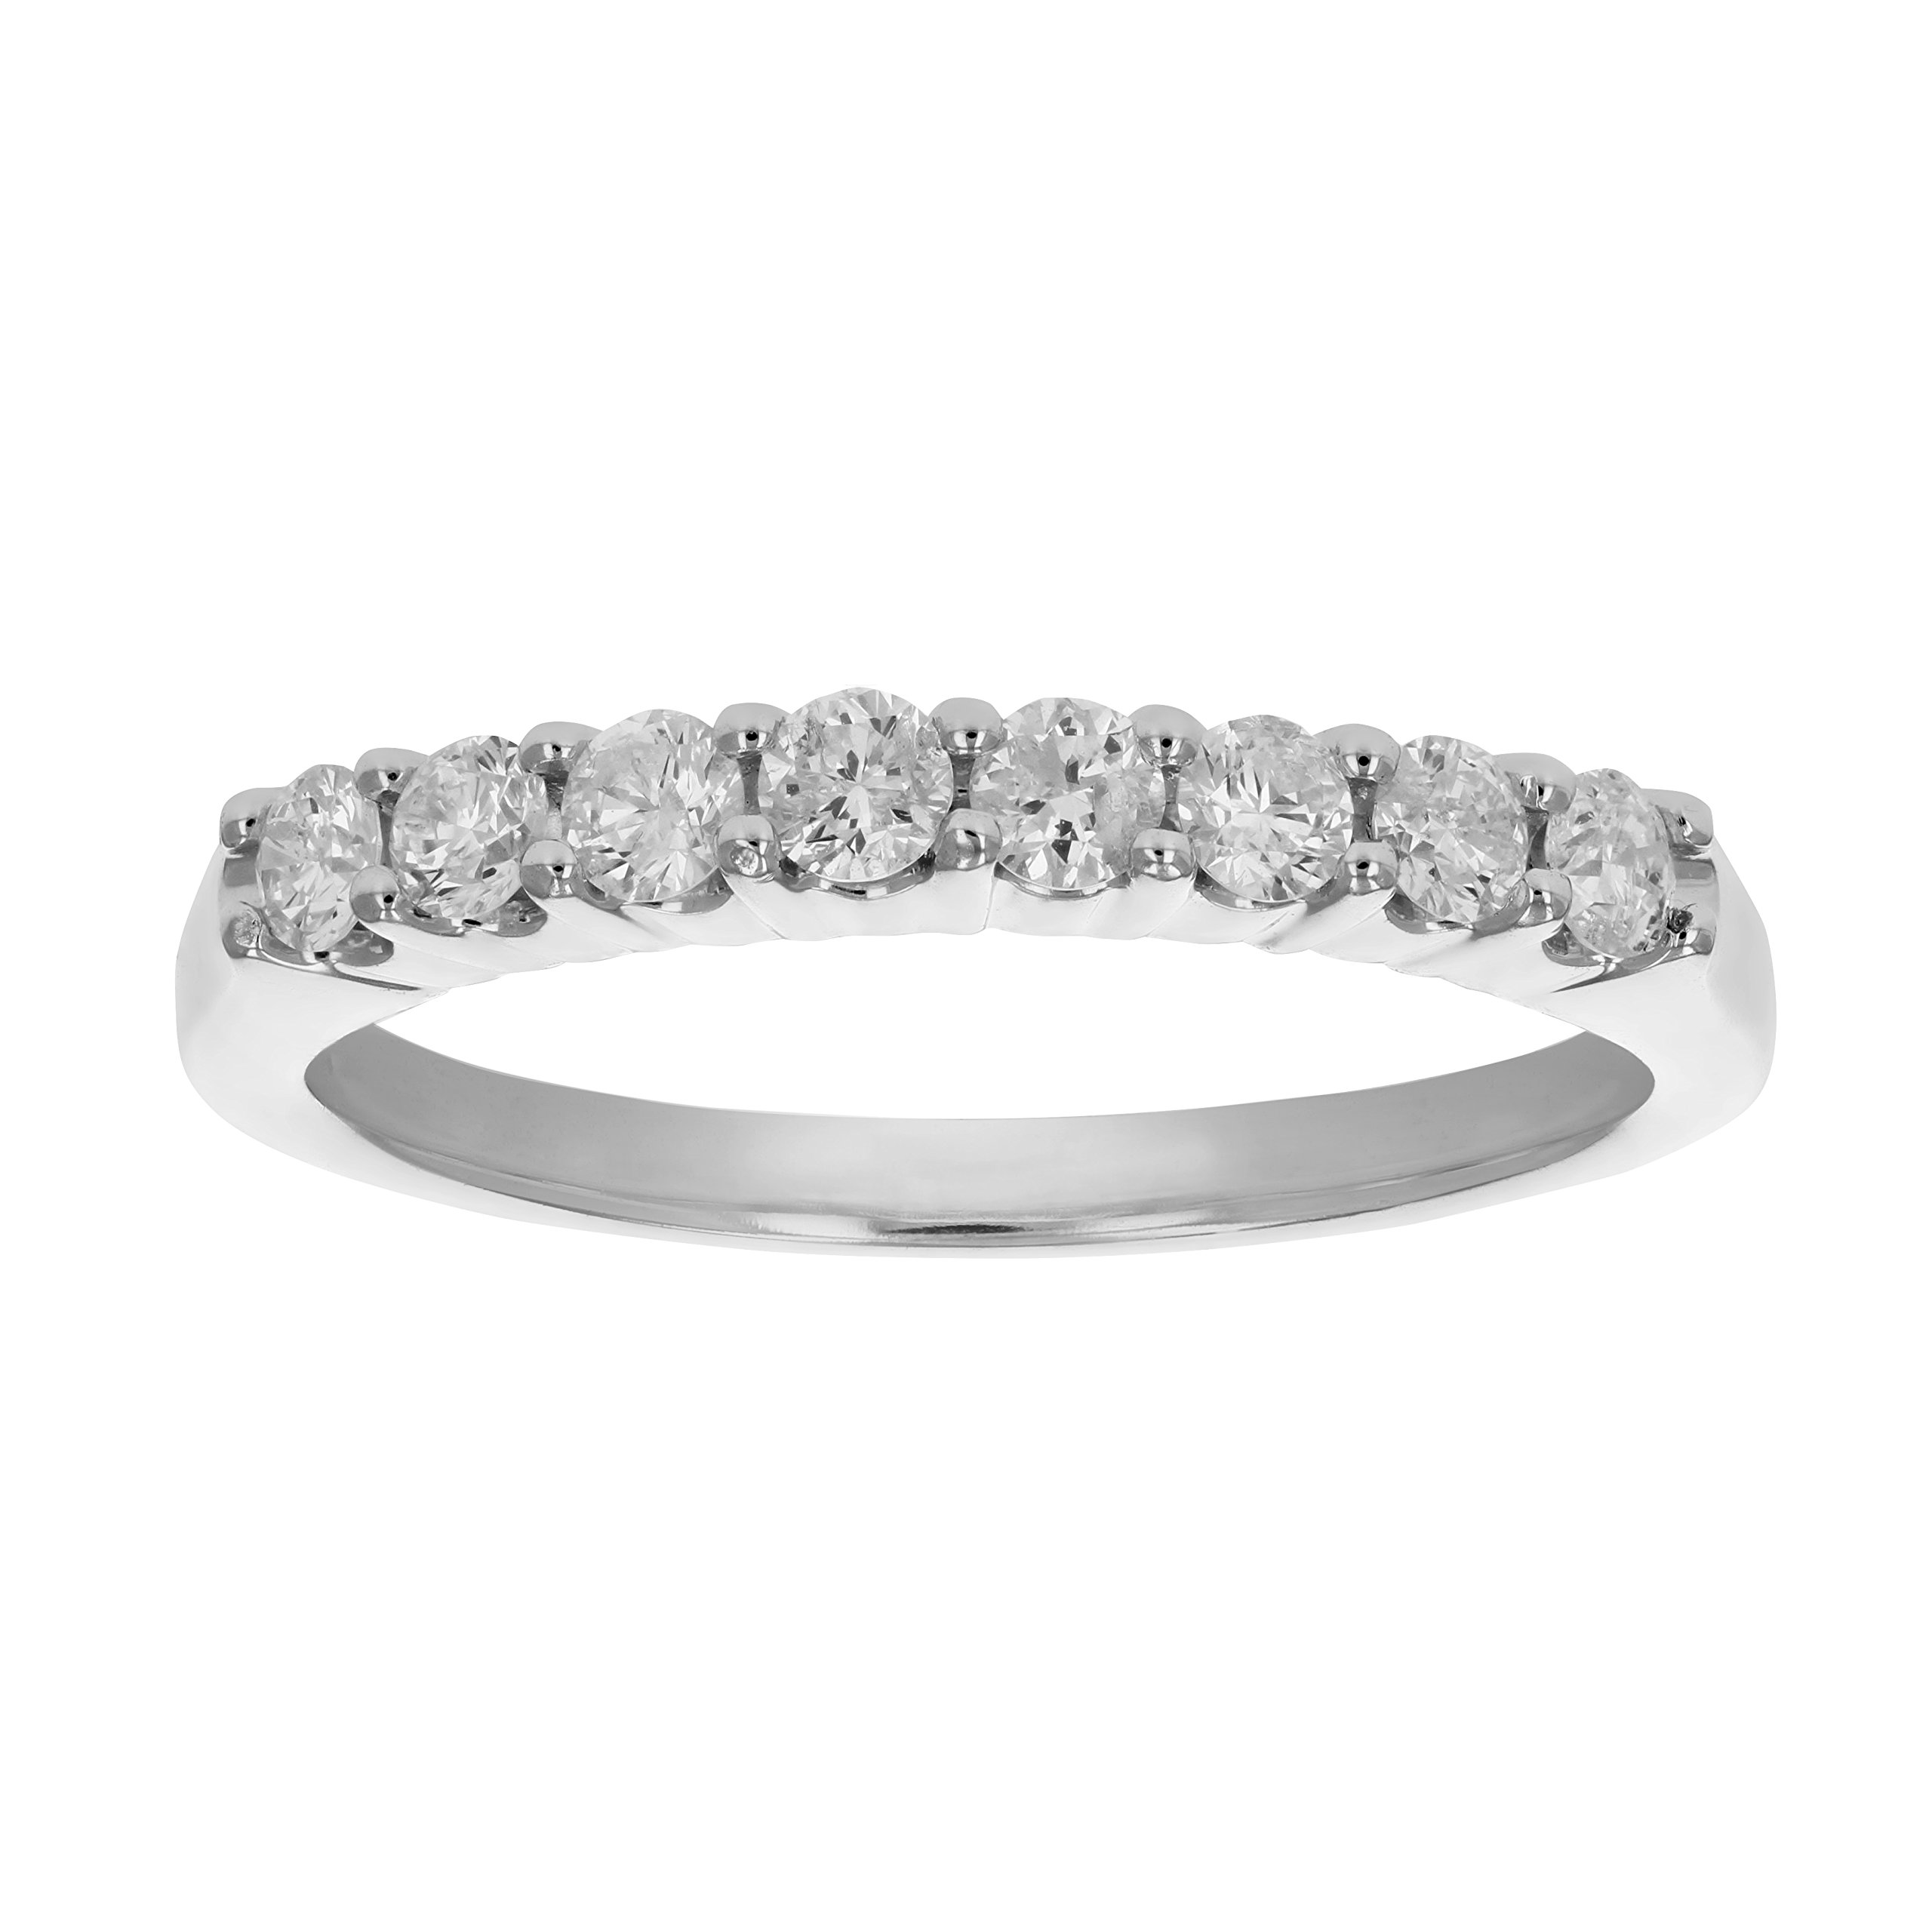 1/2 CT AGS Certified I1-I2 Diamond Wedding Band Prong Set 14K White Gold Size 7